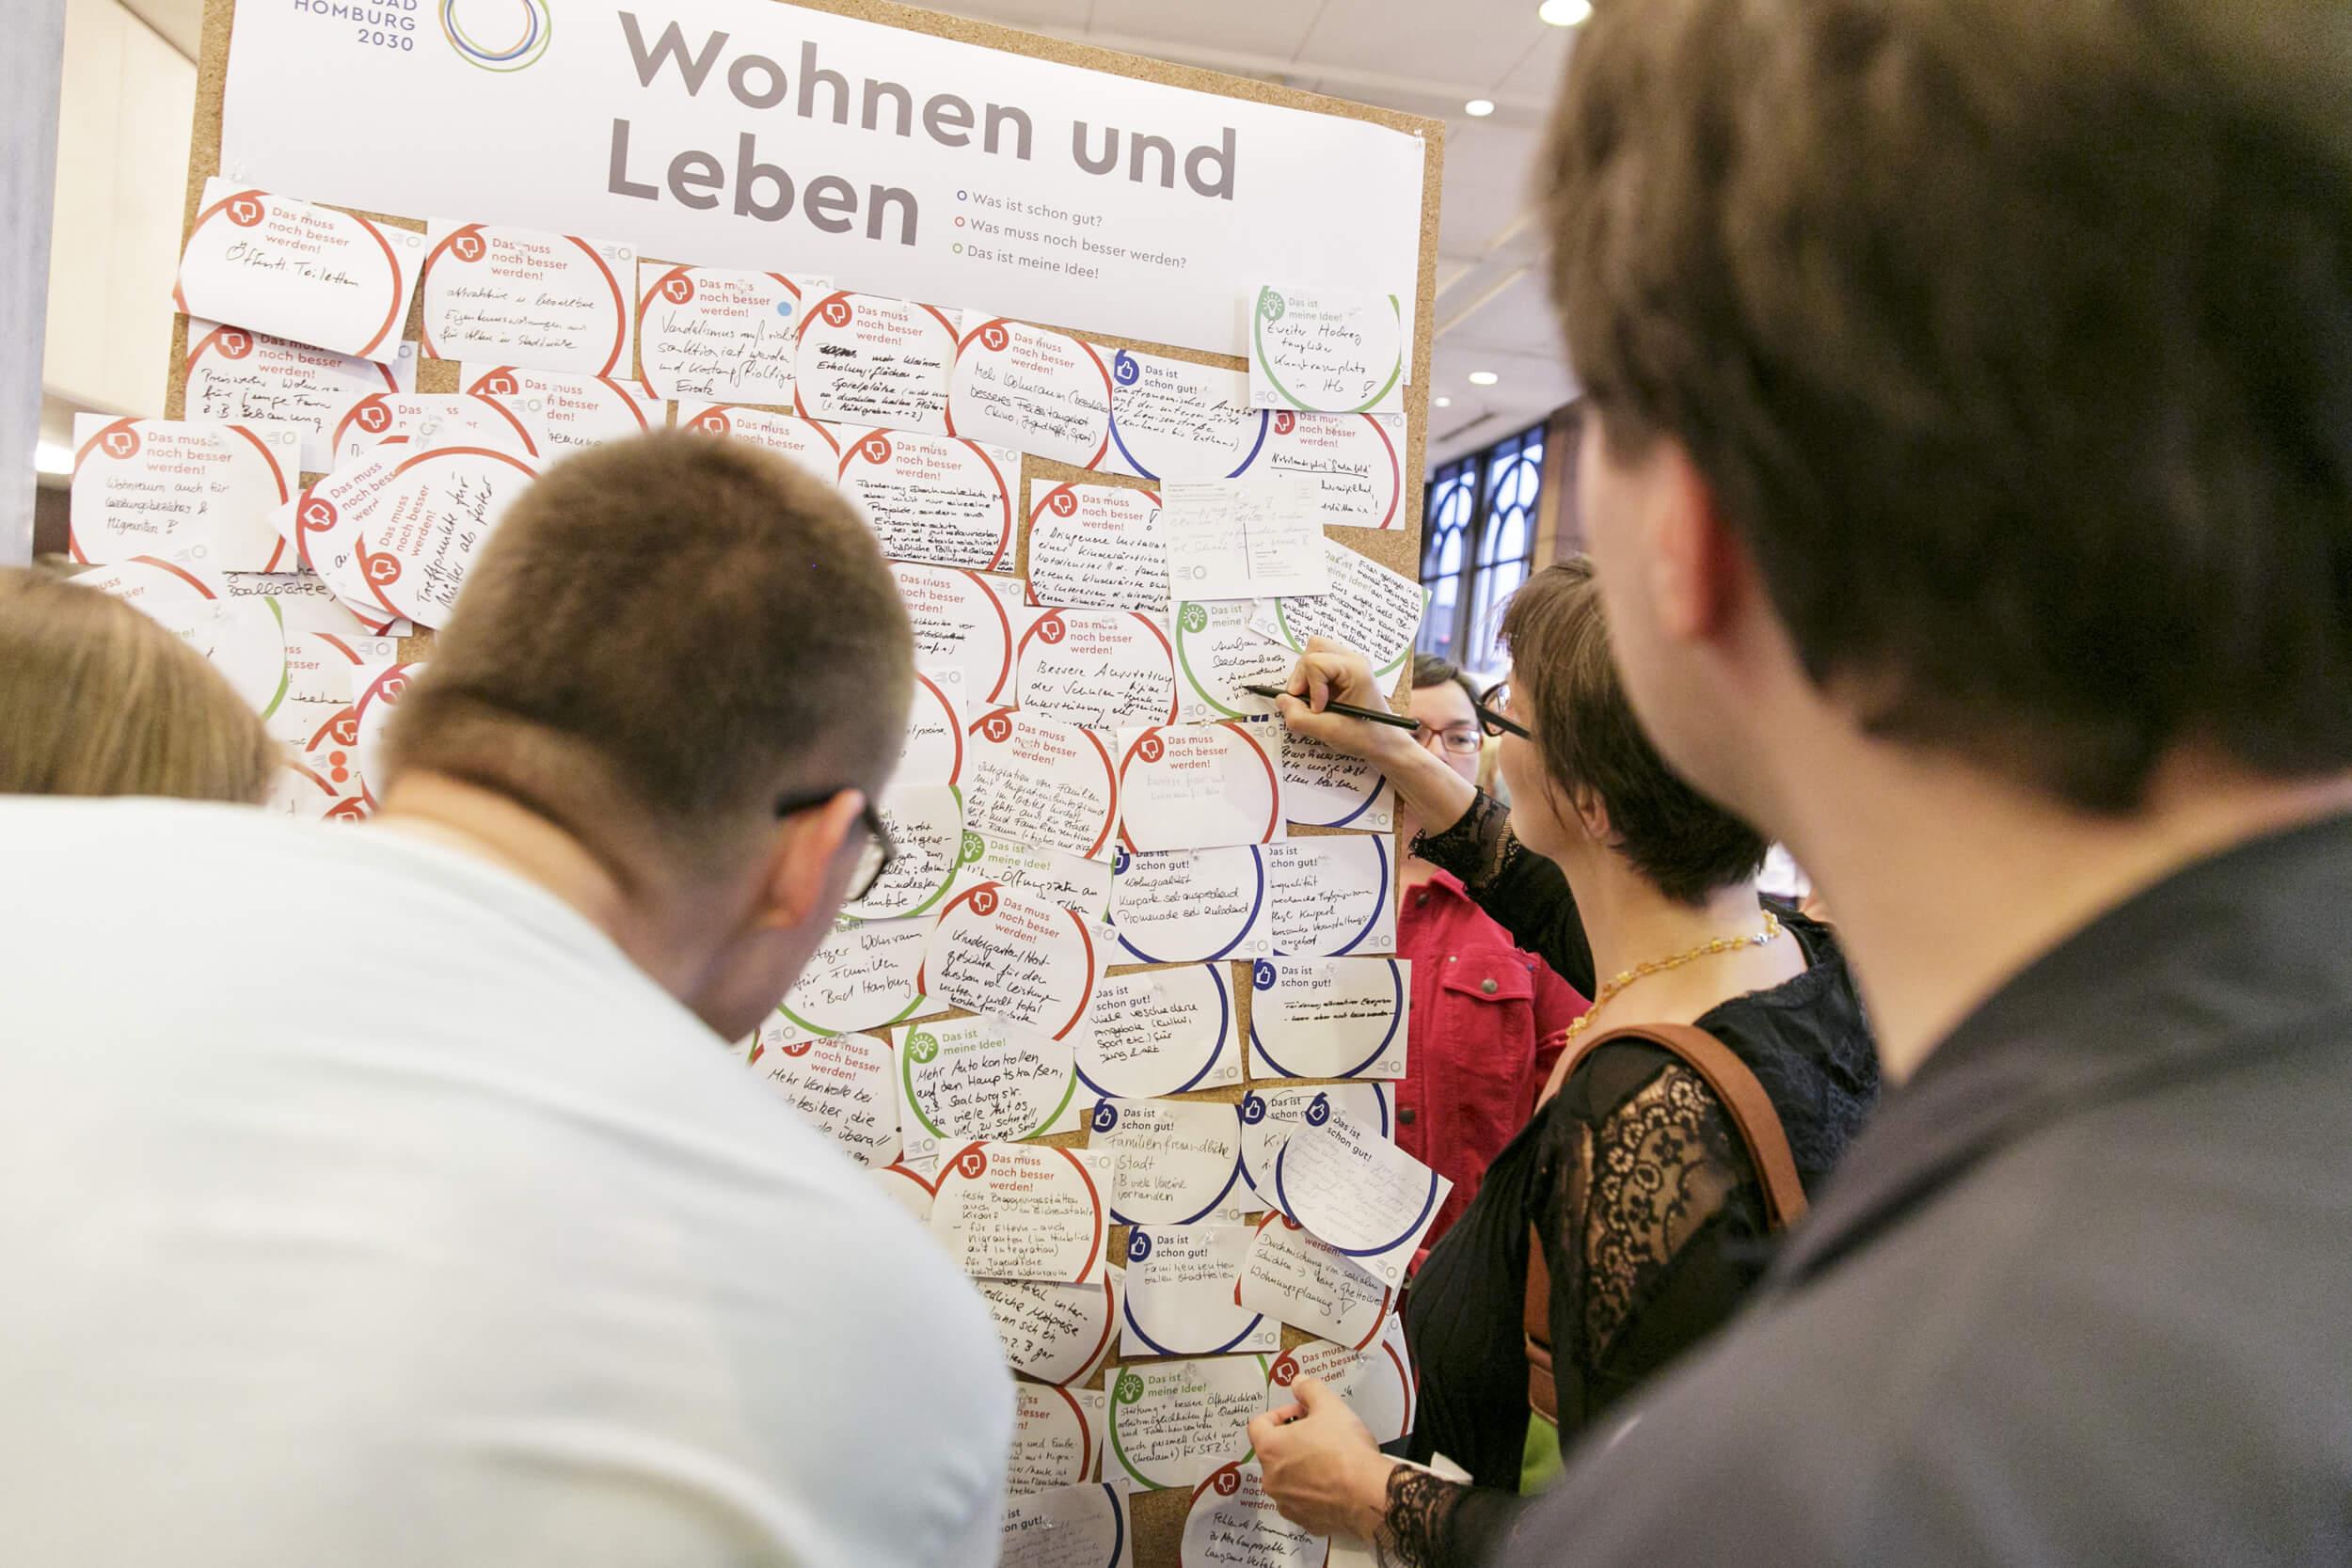 Fokus Zukunft: Bad Homburg 2030 - Ideensammlung